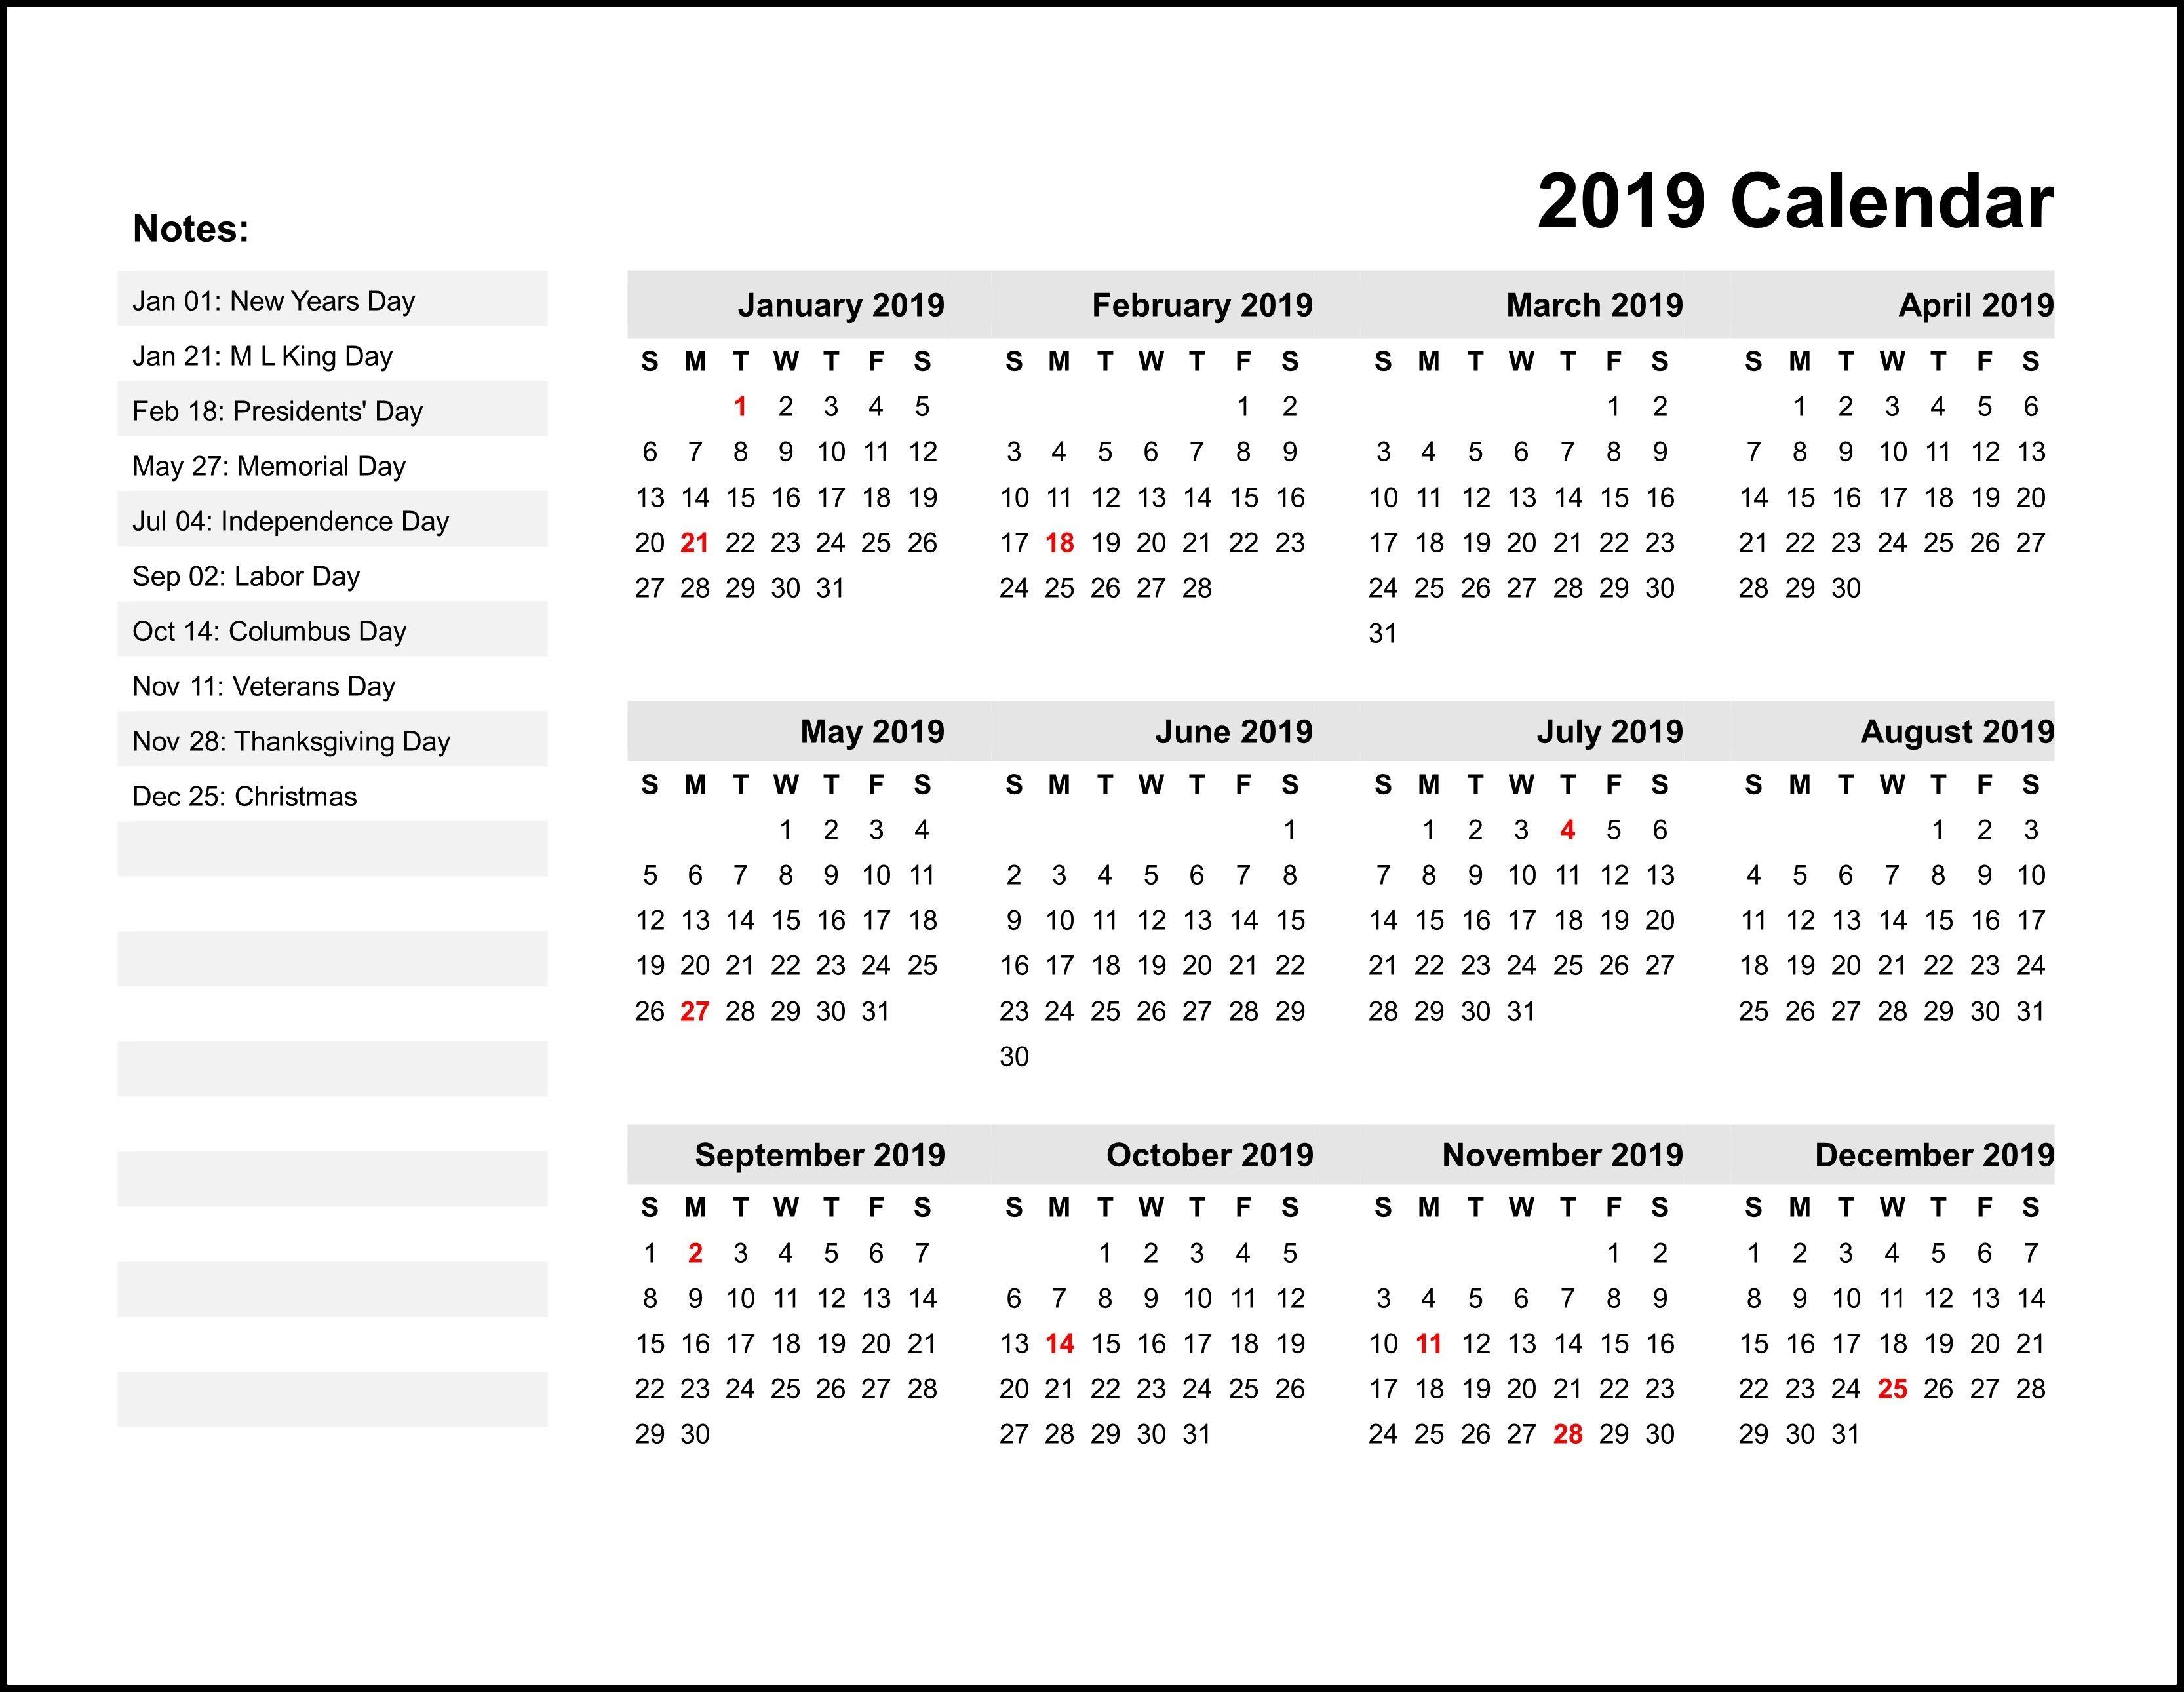 calendar 2019 india holidays calendar2019 printablecalendar holidays2019